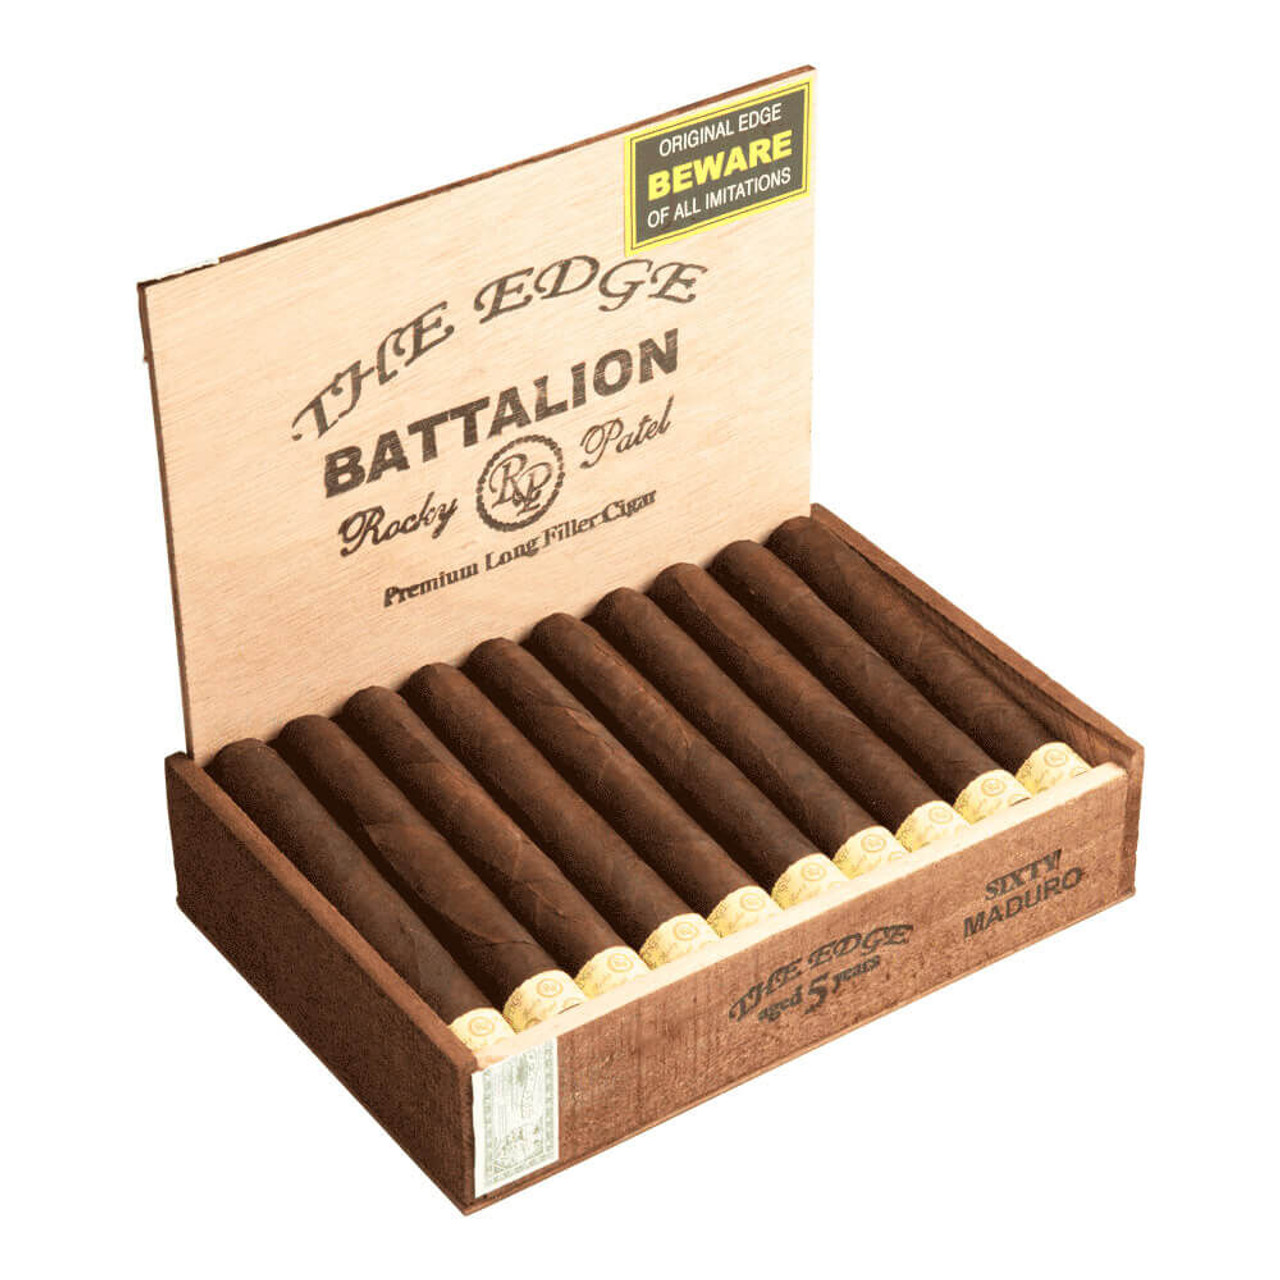 Rocky Patel The Edge Maduro Battalion Cigars - 6 x 60 (Box of 20)